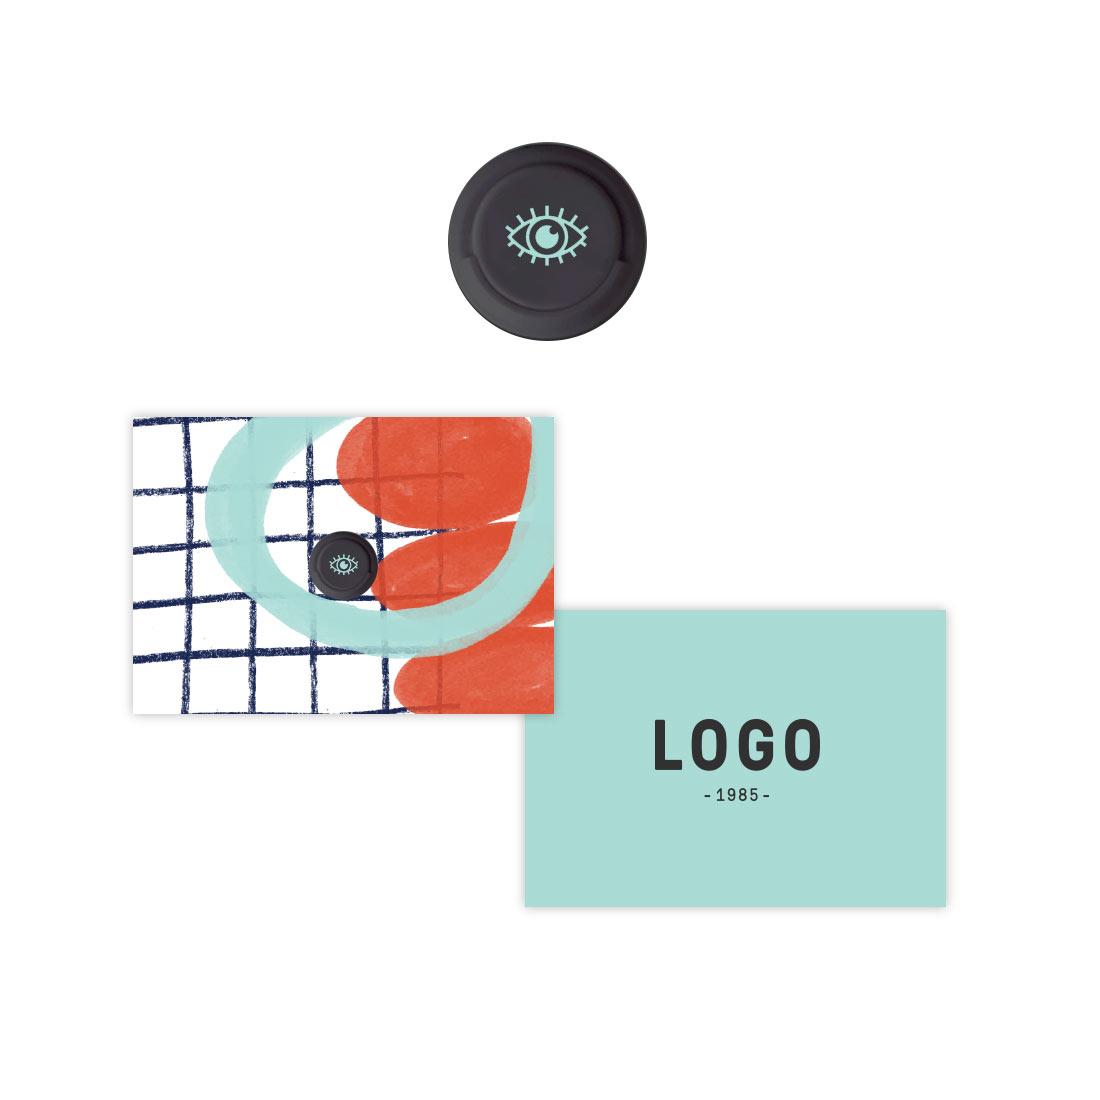 130221 peep webcam cover full color logo on webcam cover custom business card size packaging